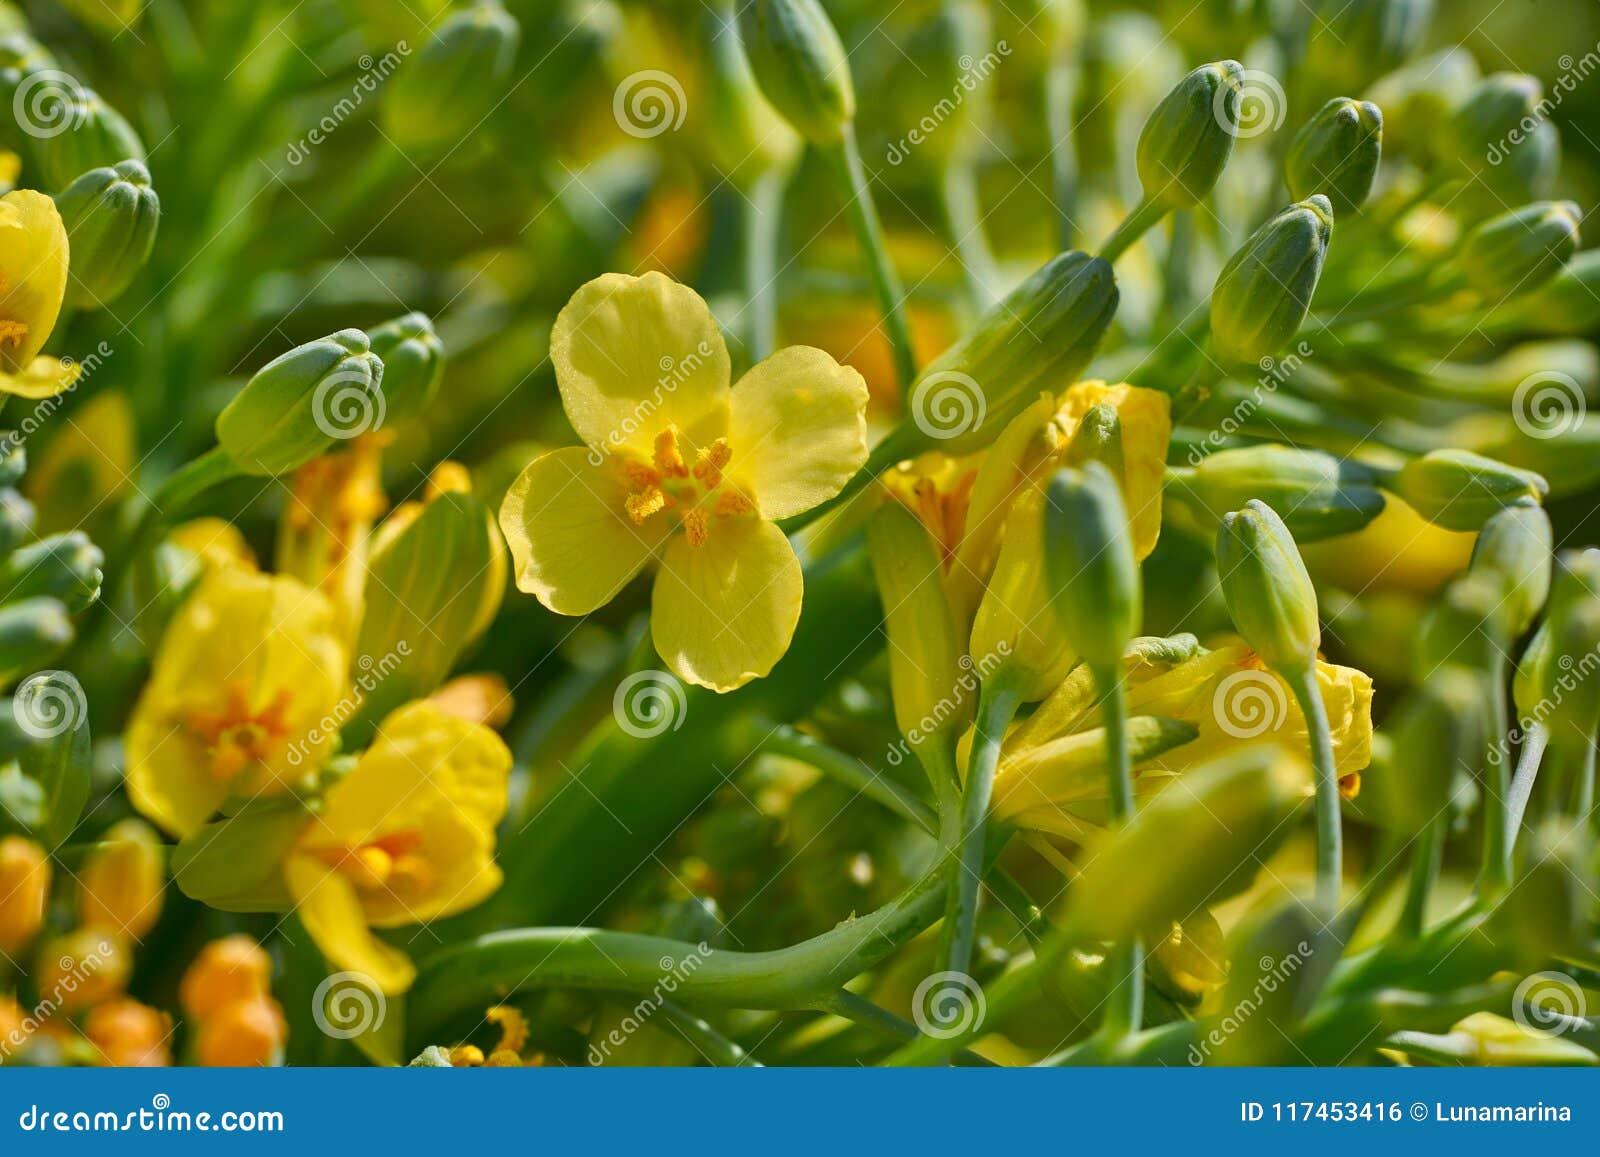 Broccoli yellow flowers macro detail stock photo image of broccoli yellow flowers macro detail mightylinksfo